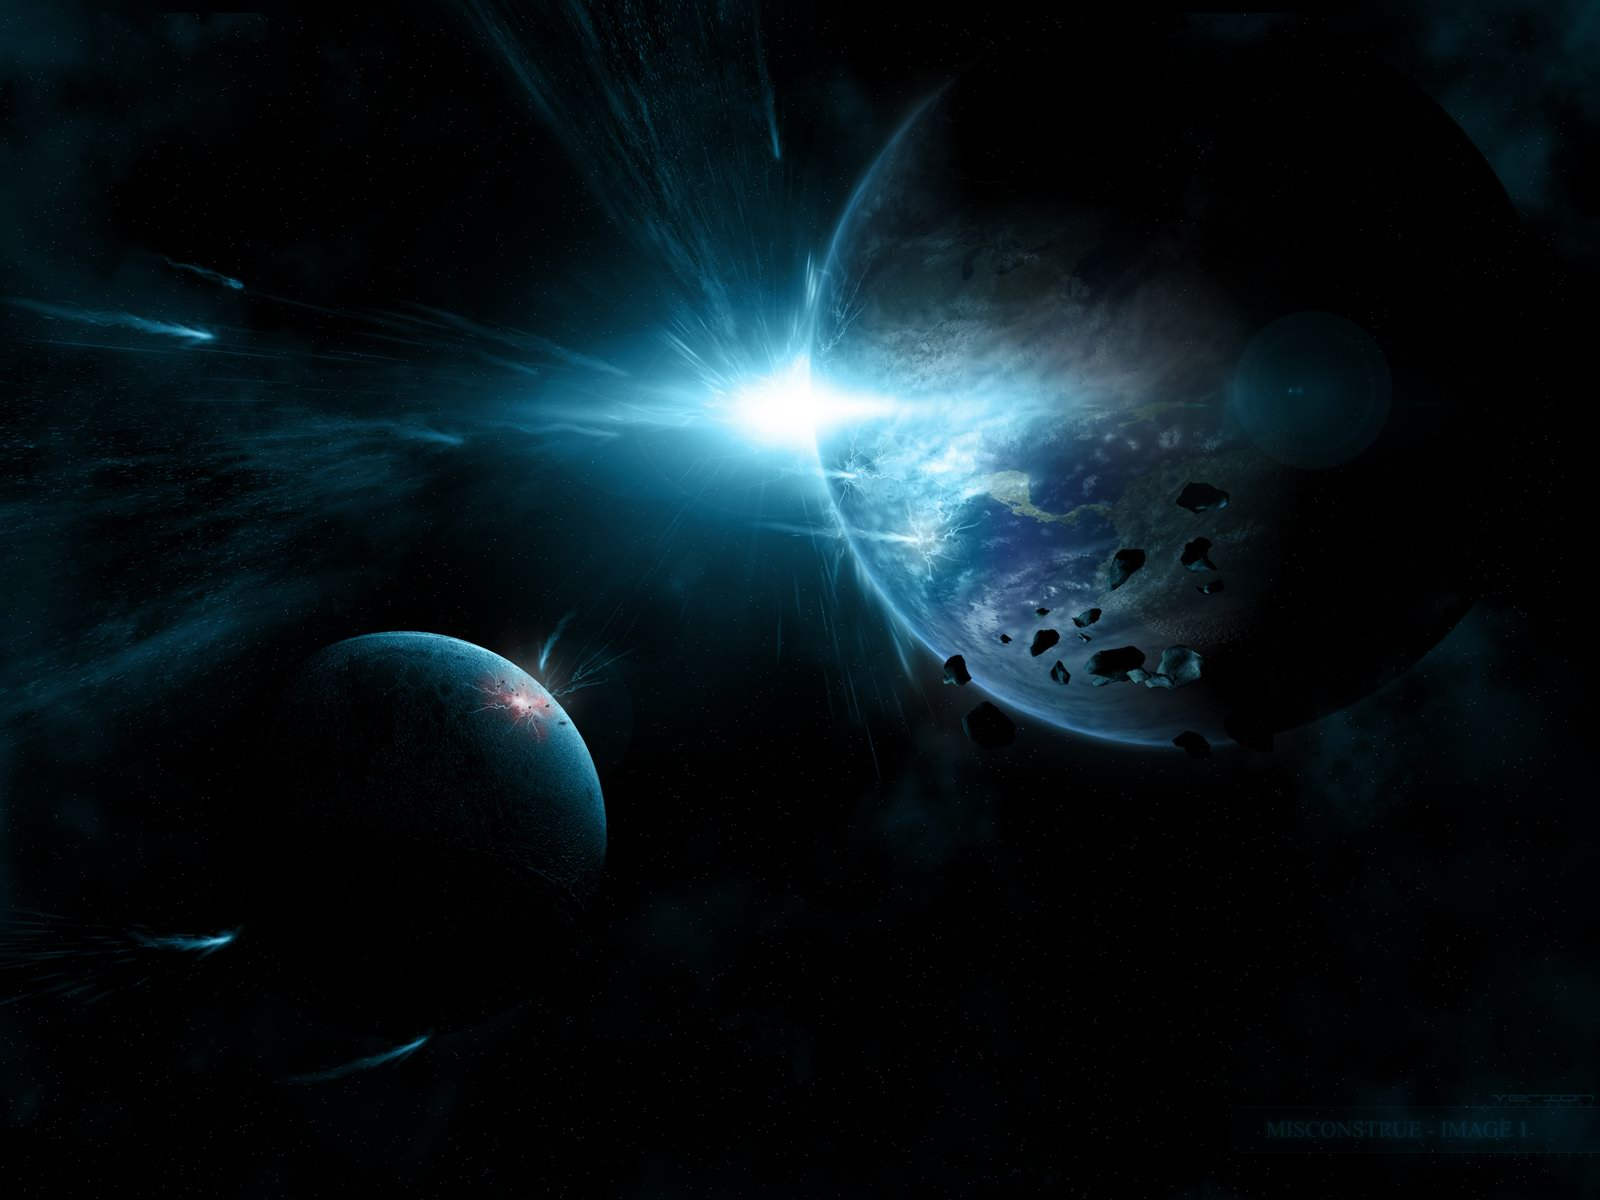 Download deep blue space scene HD wallpaper 1600x1200